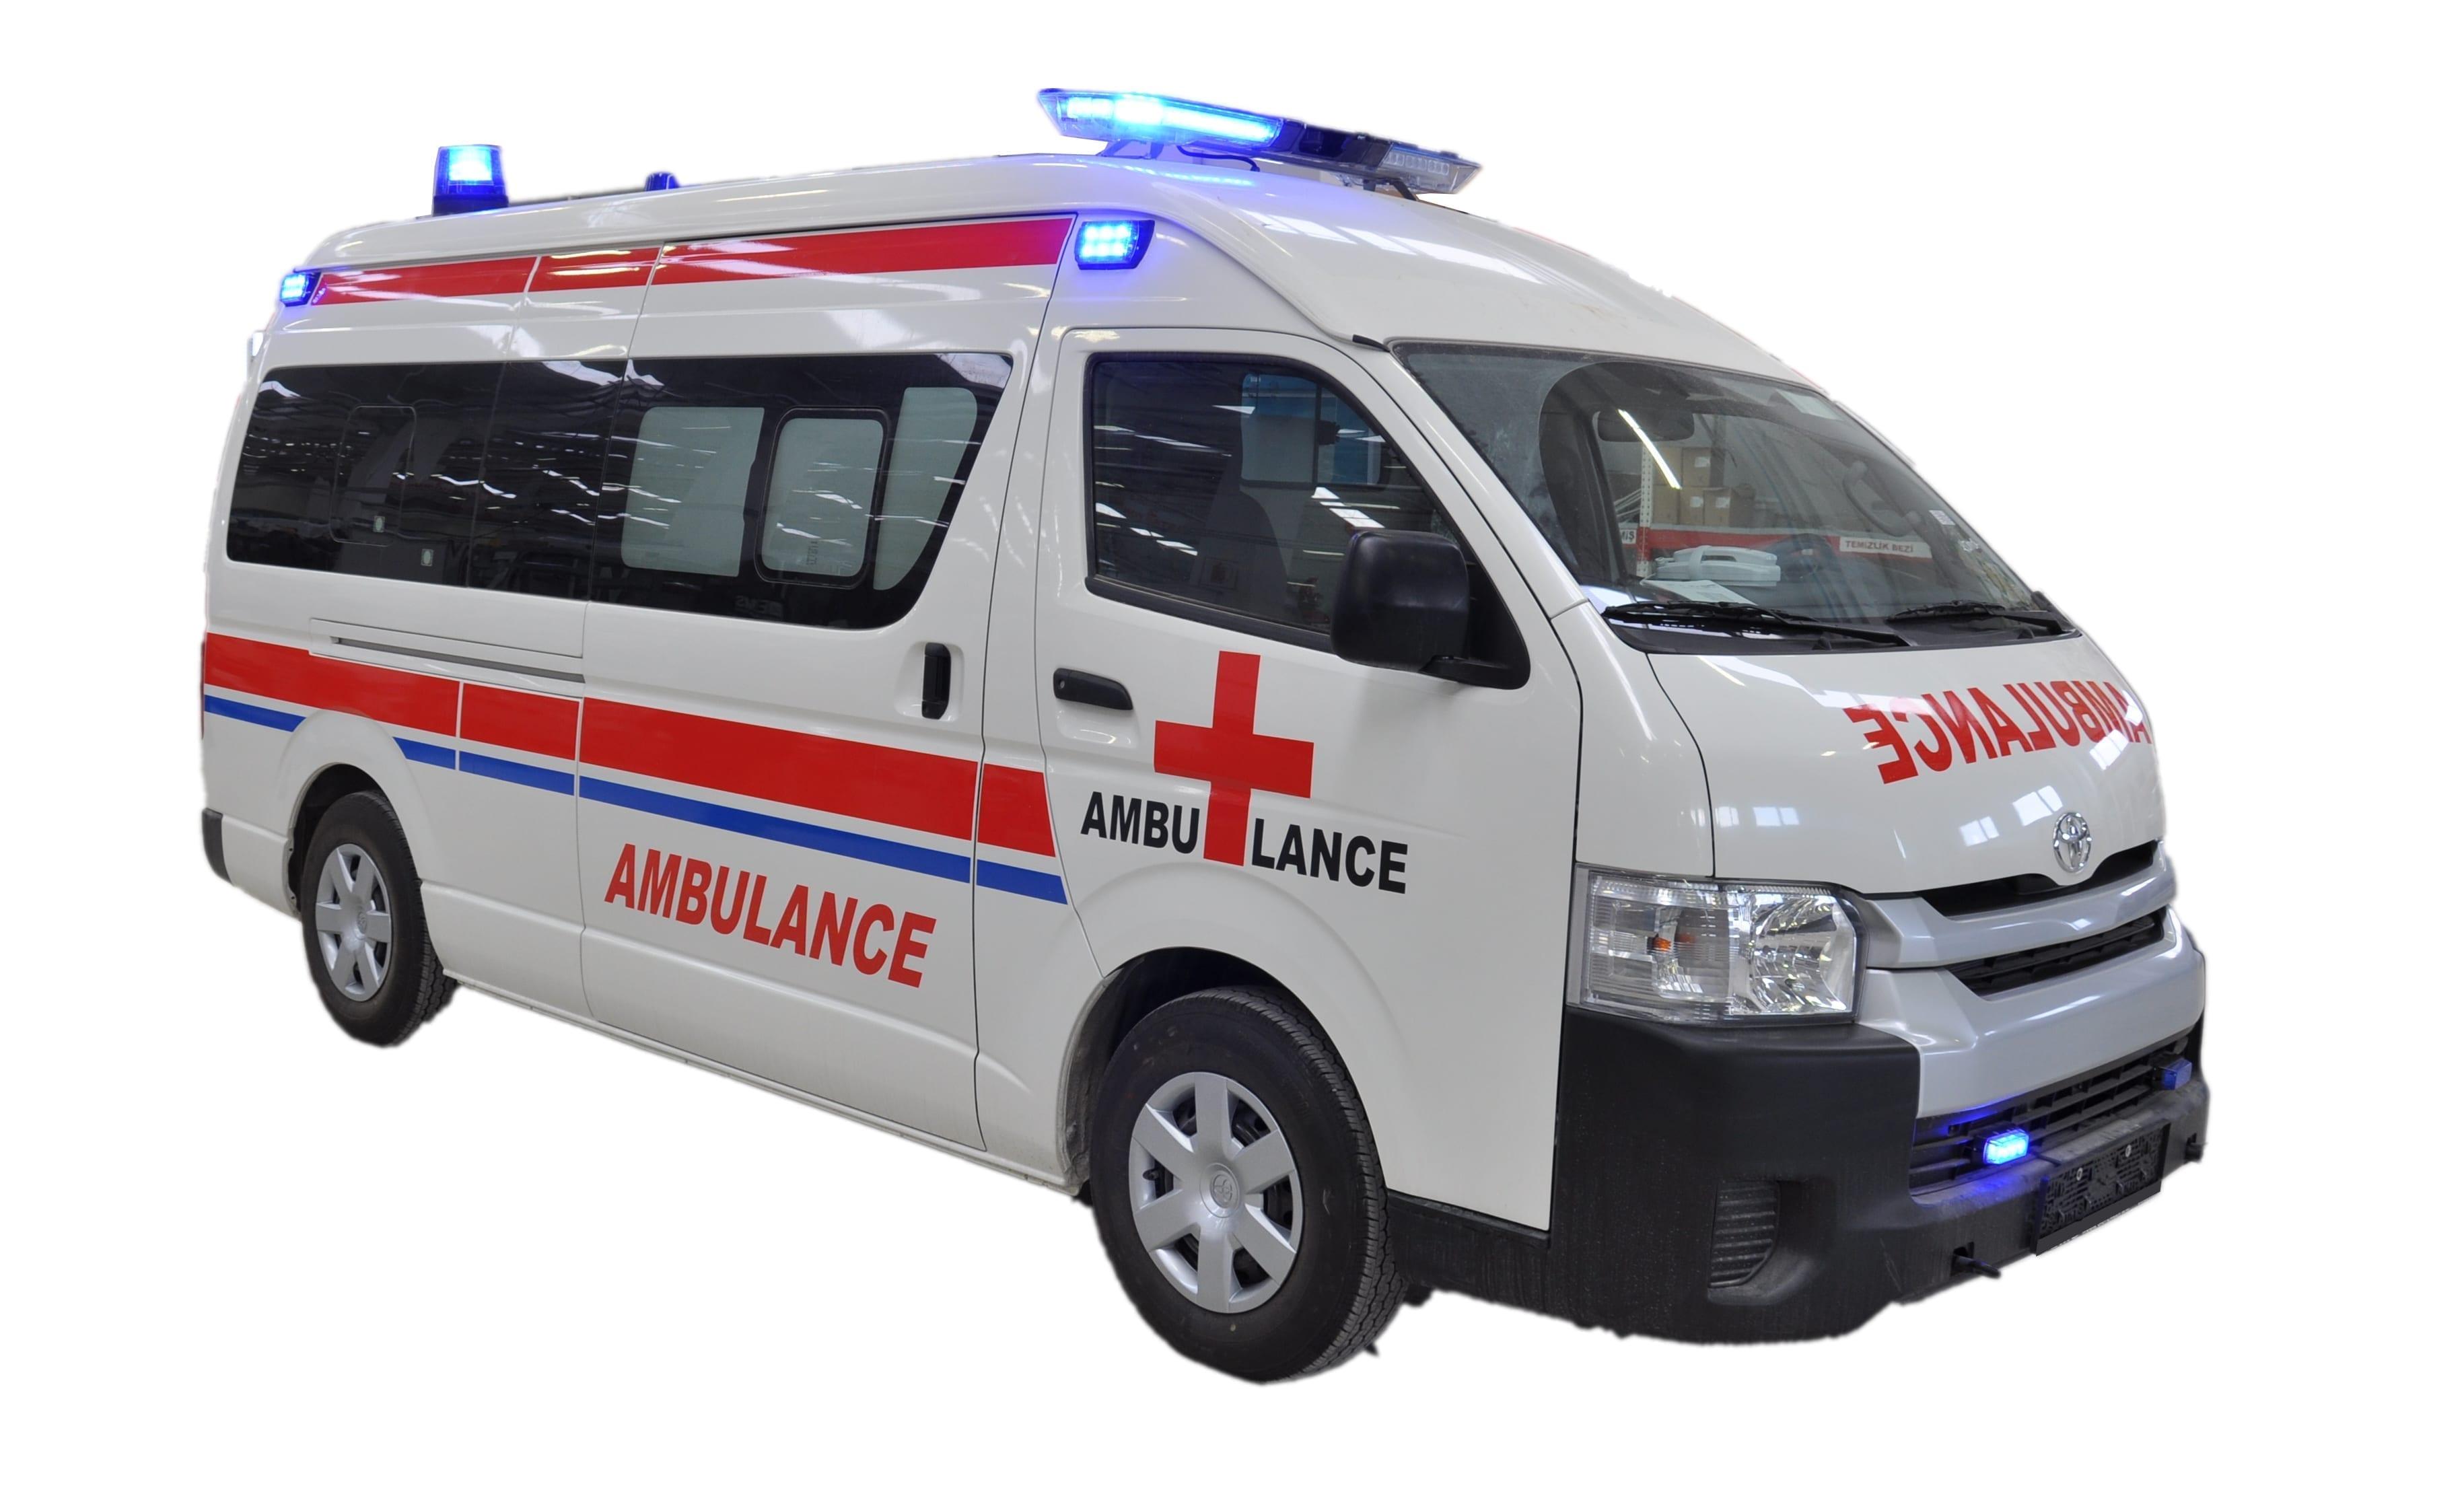 Toyota Hiace Ambulance - Ambulances and Mobile Health Vehicles